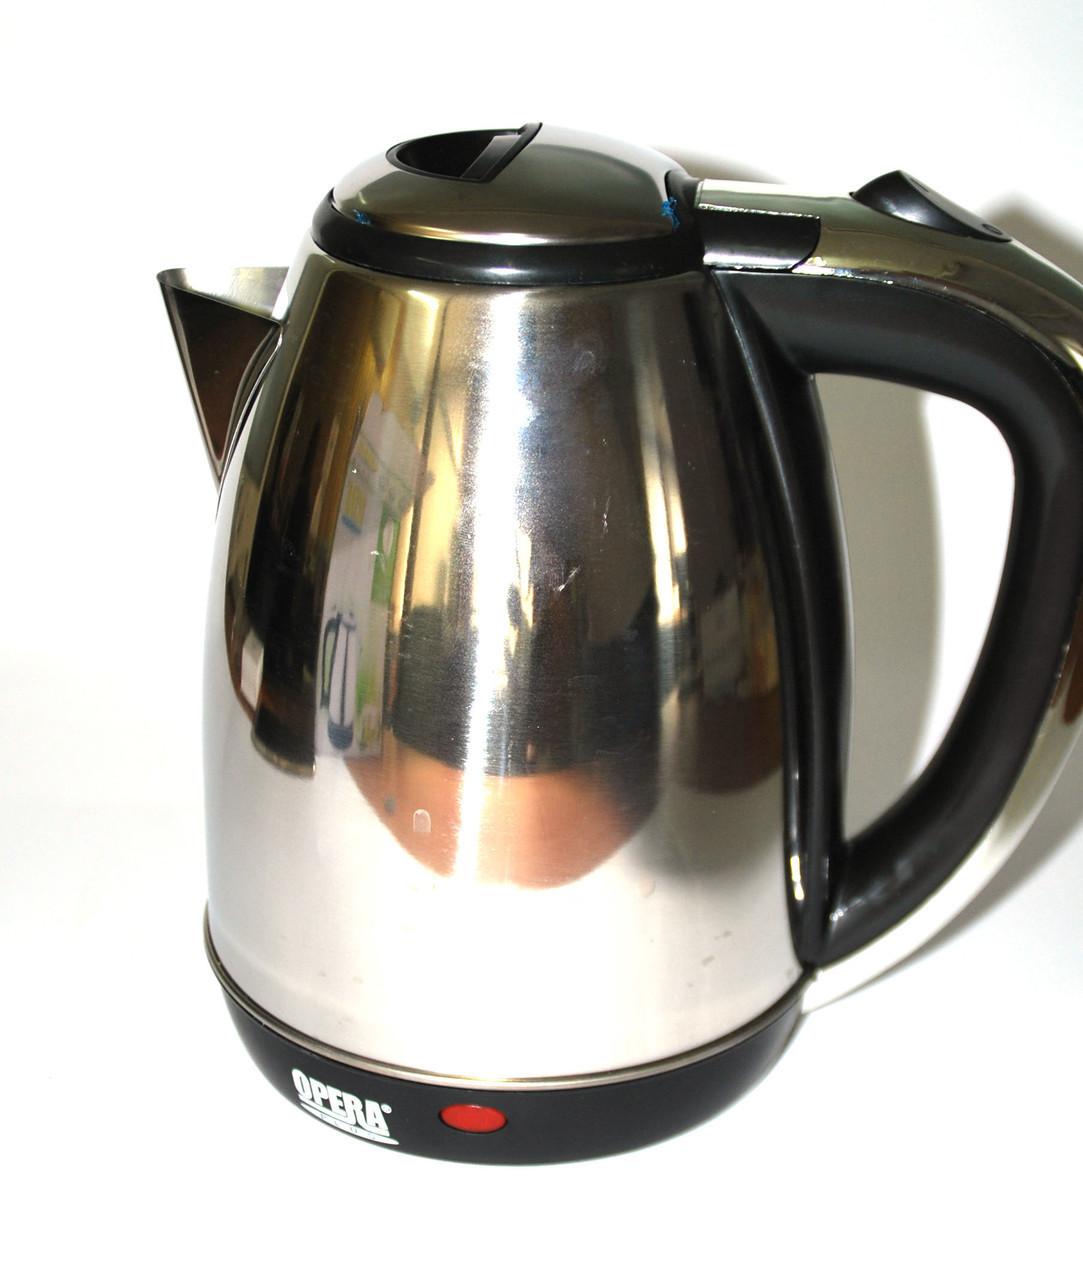 Електричний чайник OP-803 CG11